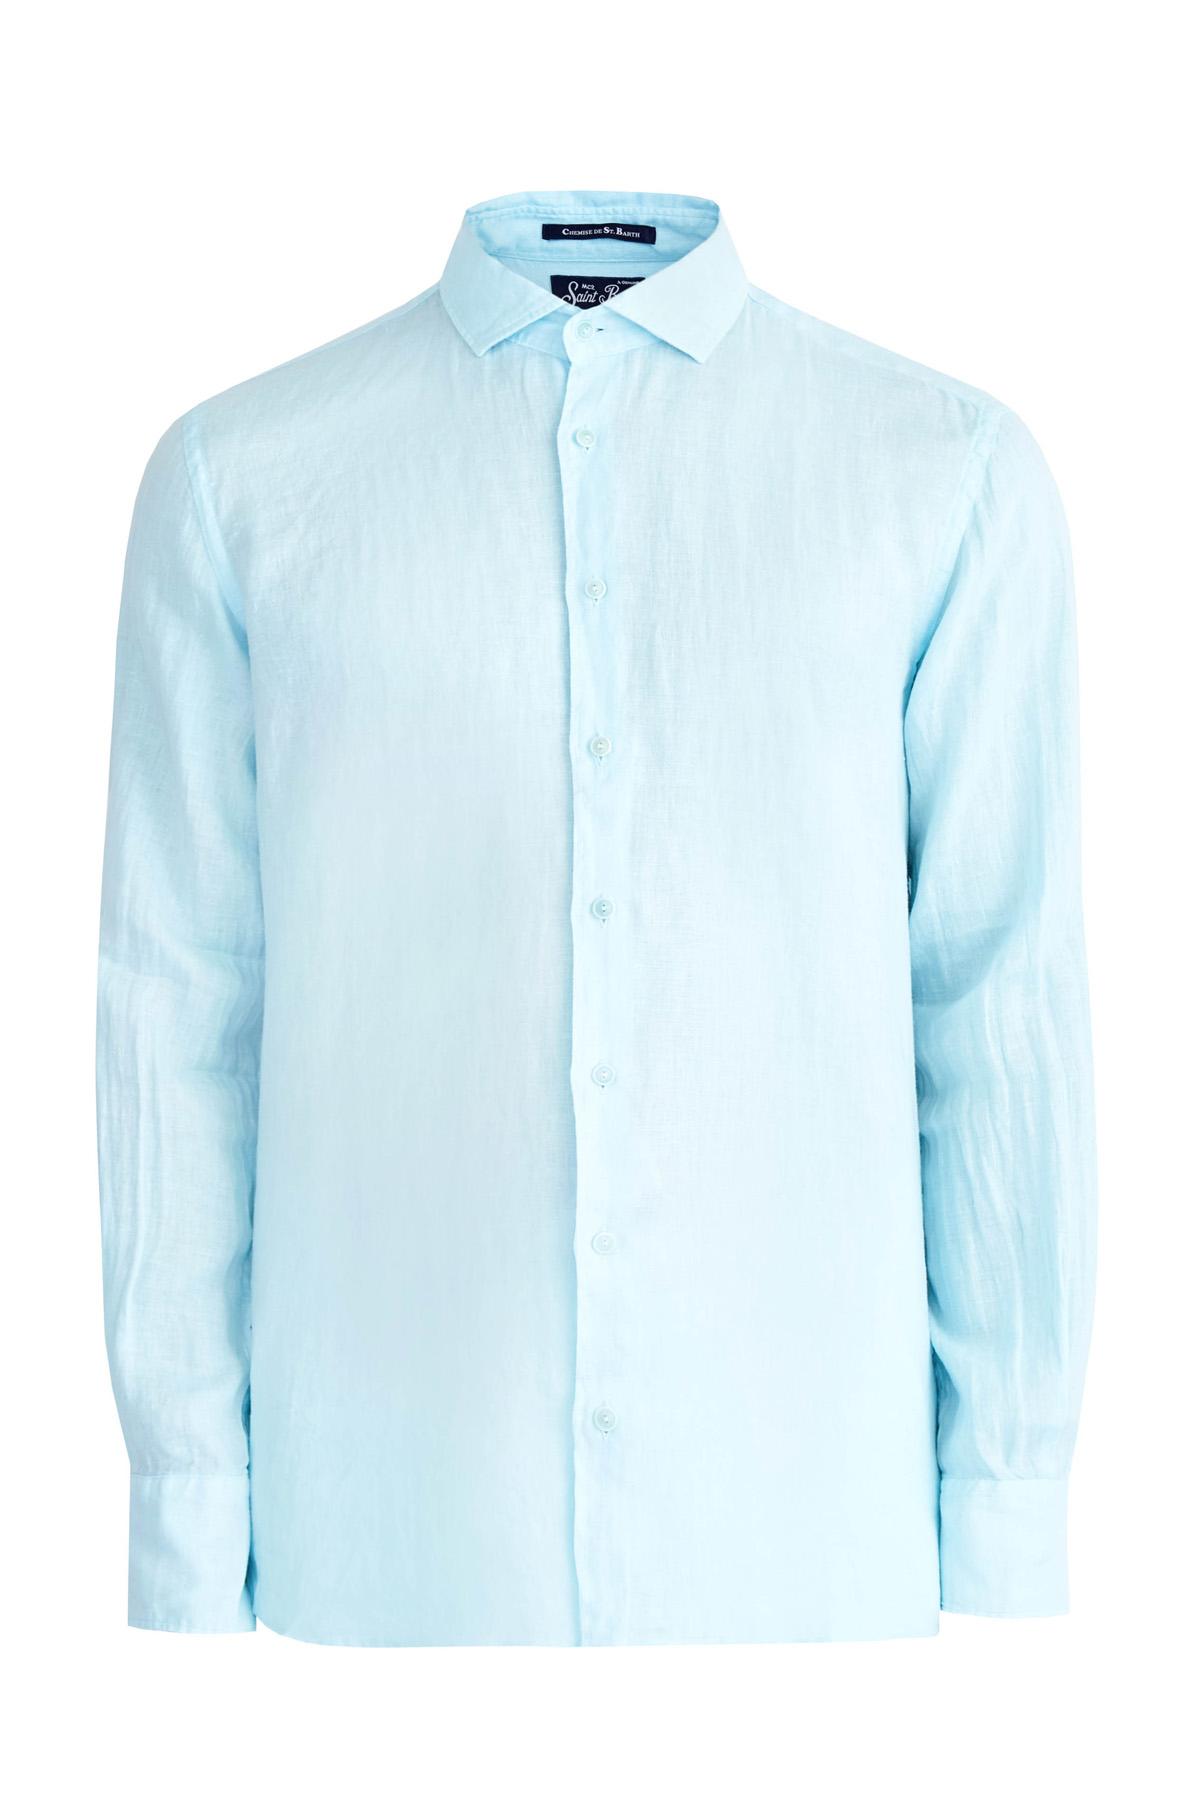 Купить Рубашка, MC2 SAINT BARTH, Италия, лен 100%